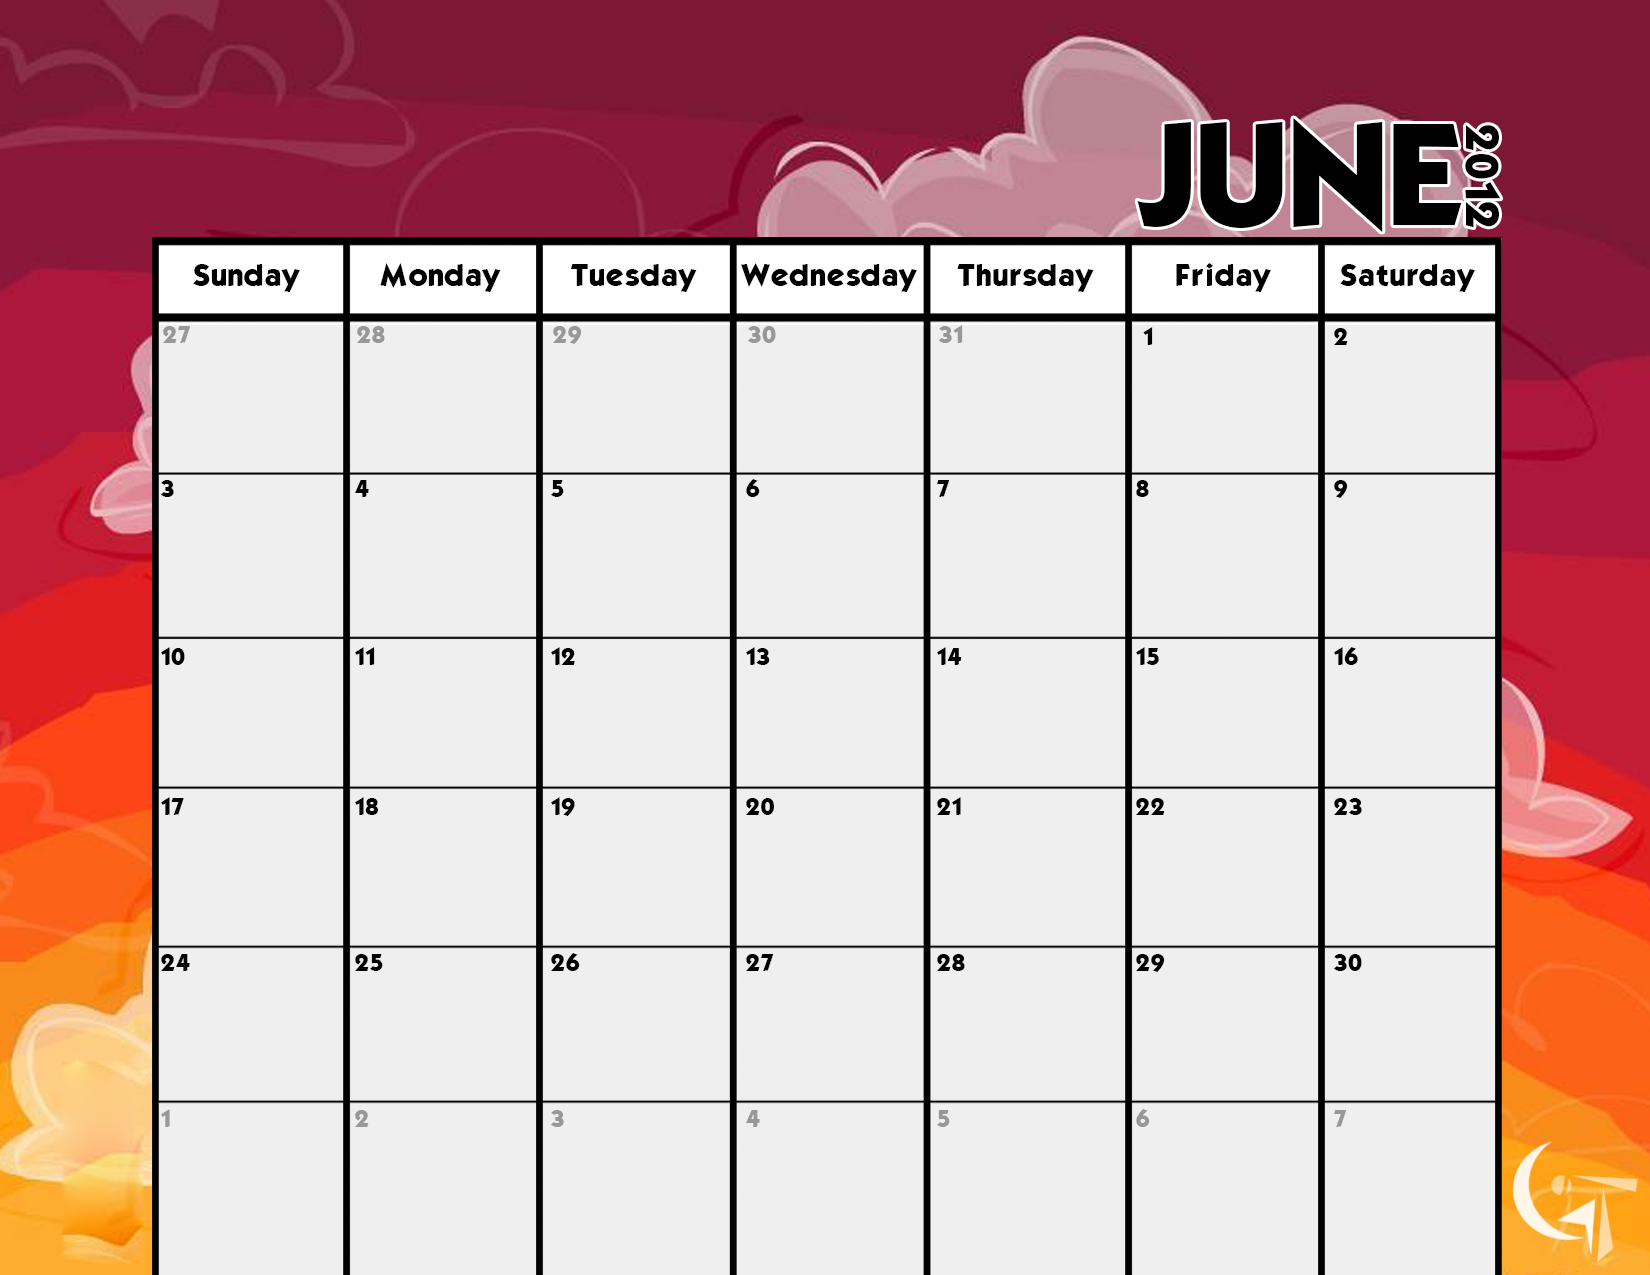 Calendar Template by GENAYNAY.deviantart.com on @DeviantArt | ⊰ฺ ...